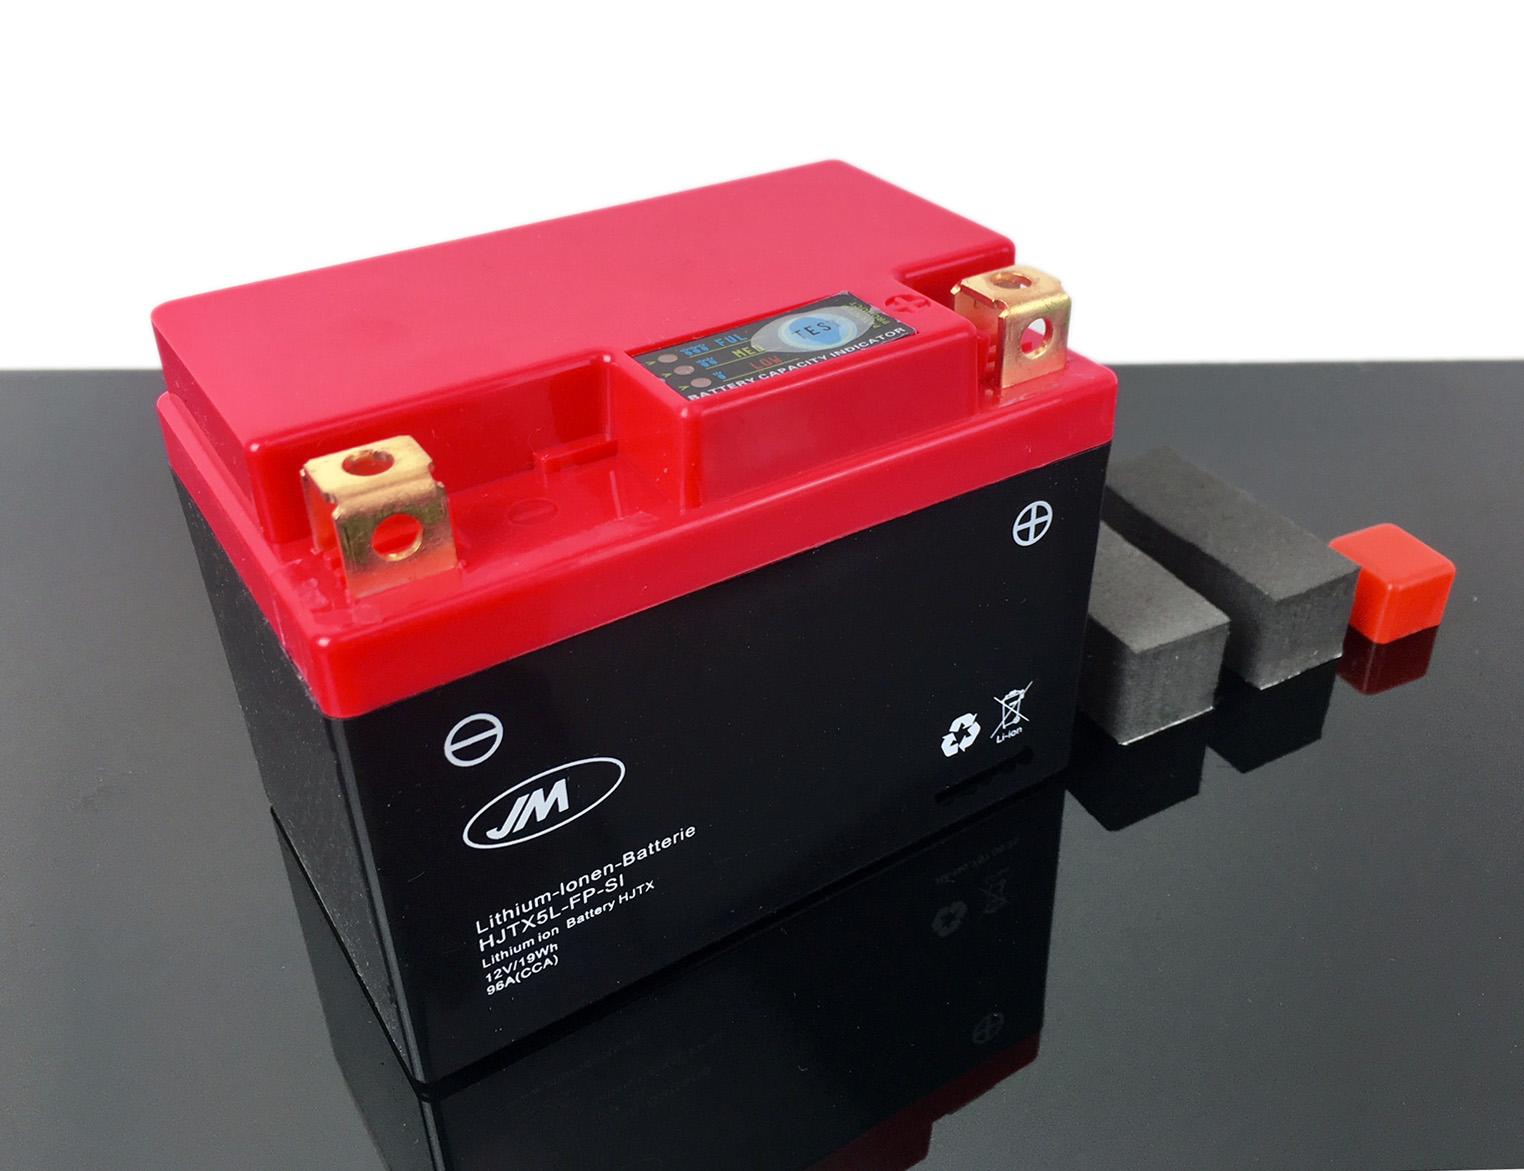 lithium ionen lifepo4 motorrad mini akku batterie battery. Black Bedroom Furniture Sets. Home Design Ideas